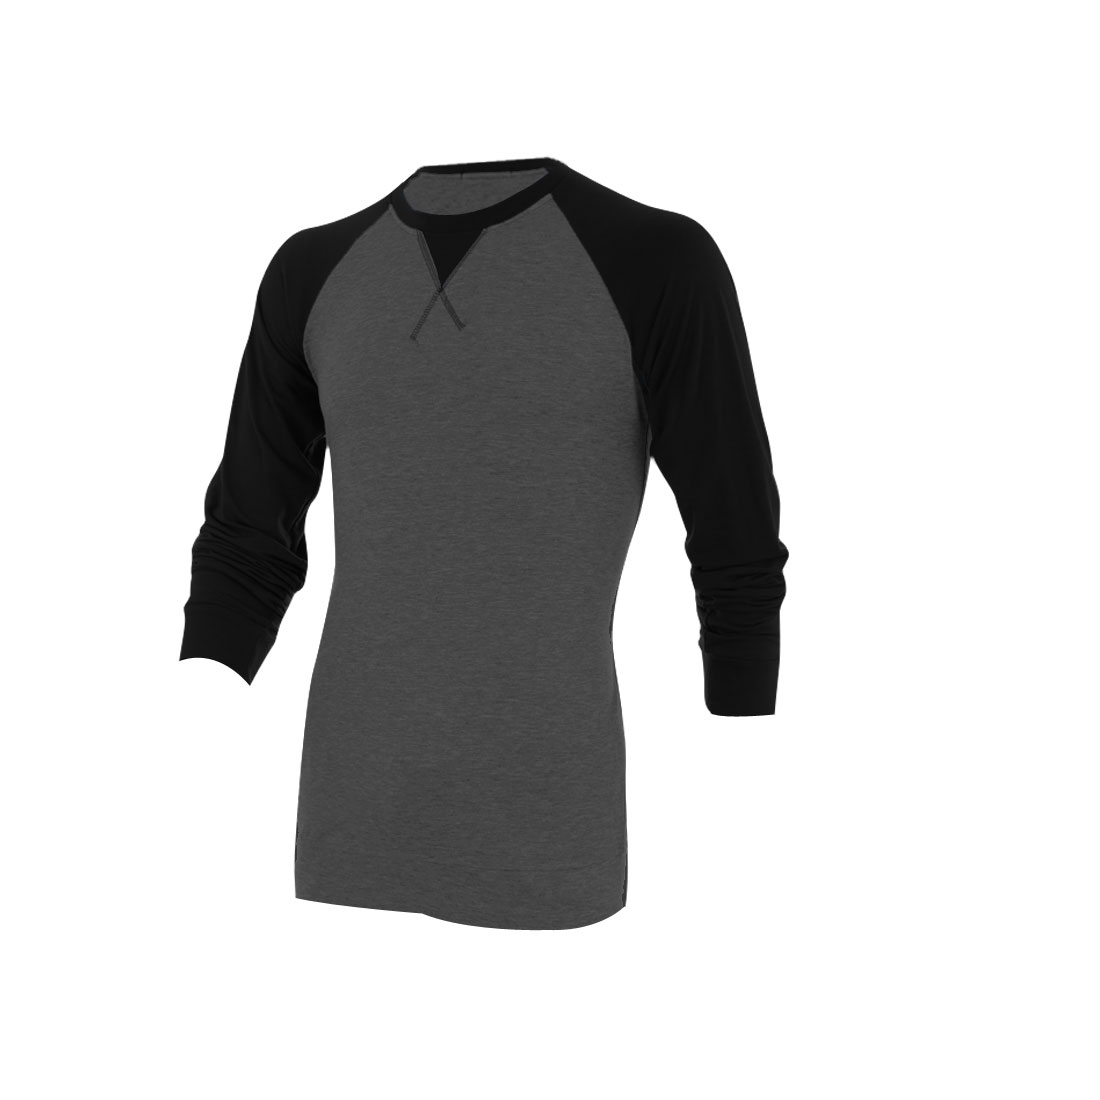 Mens Round Neck Long Raglan Sleeve Design Splice Dark Gray Tee Shirt M